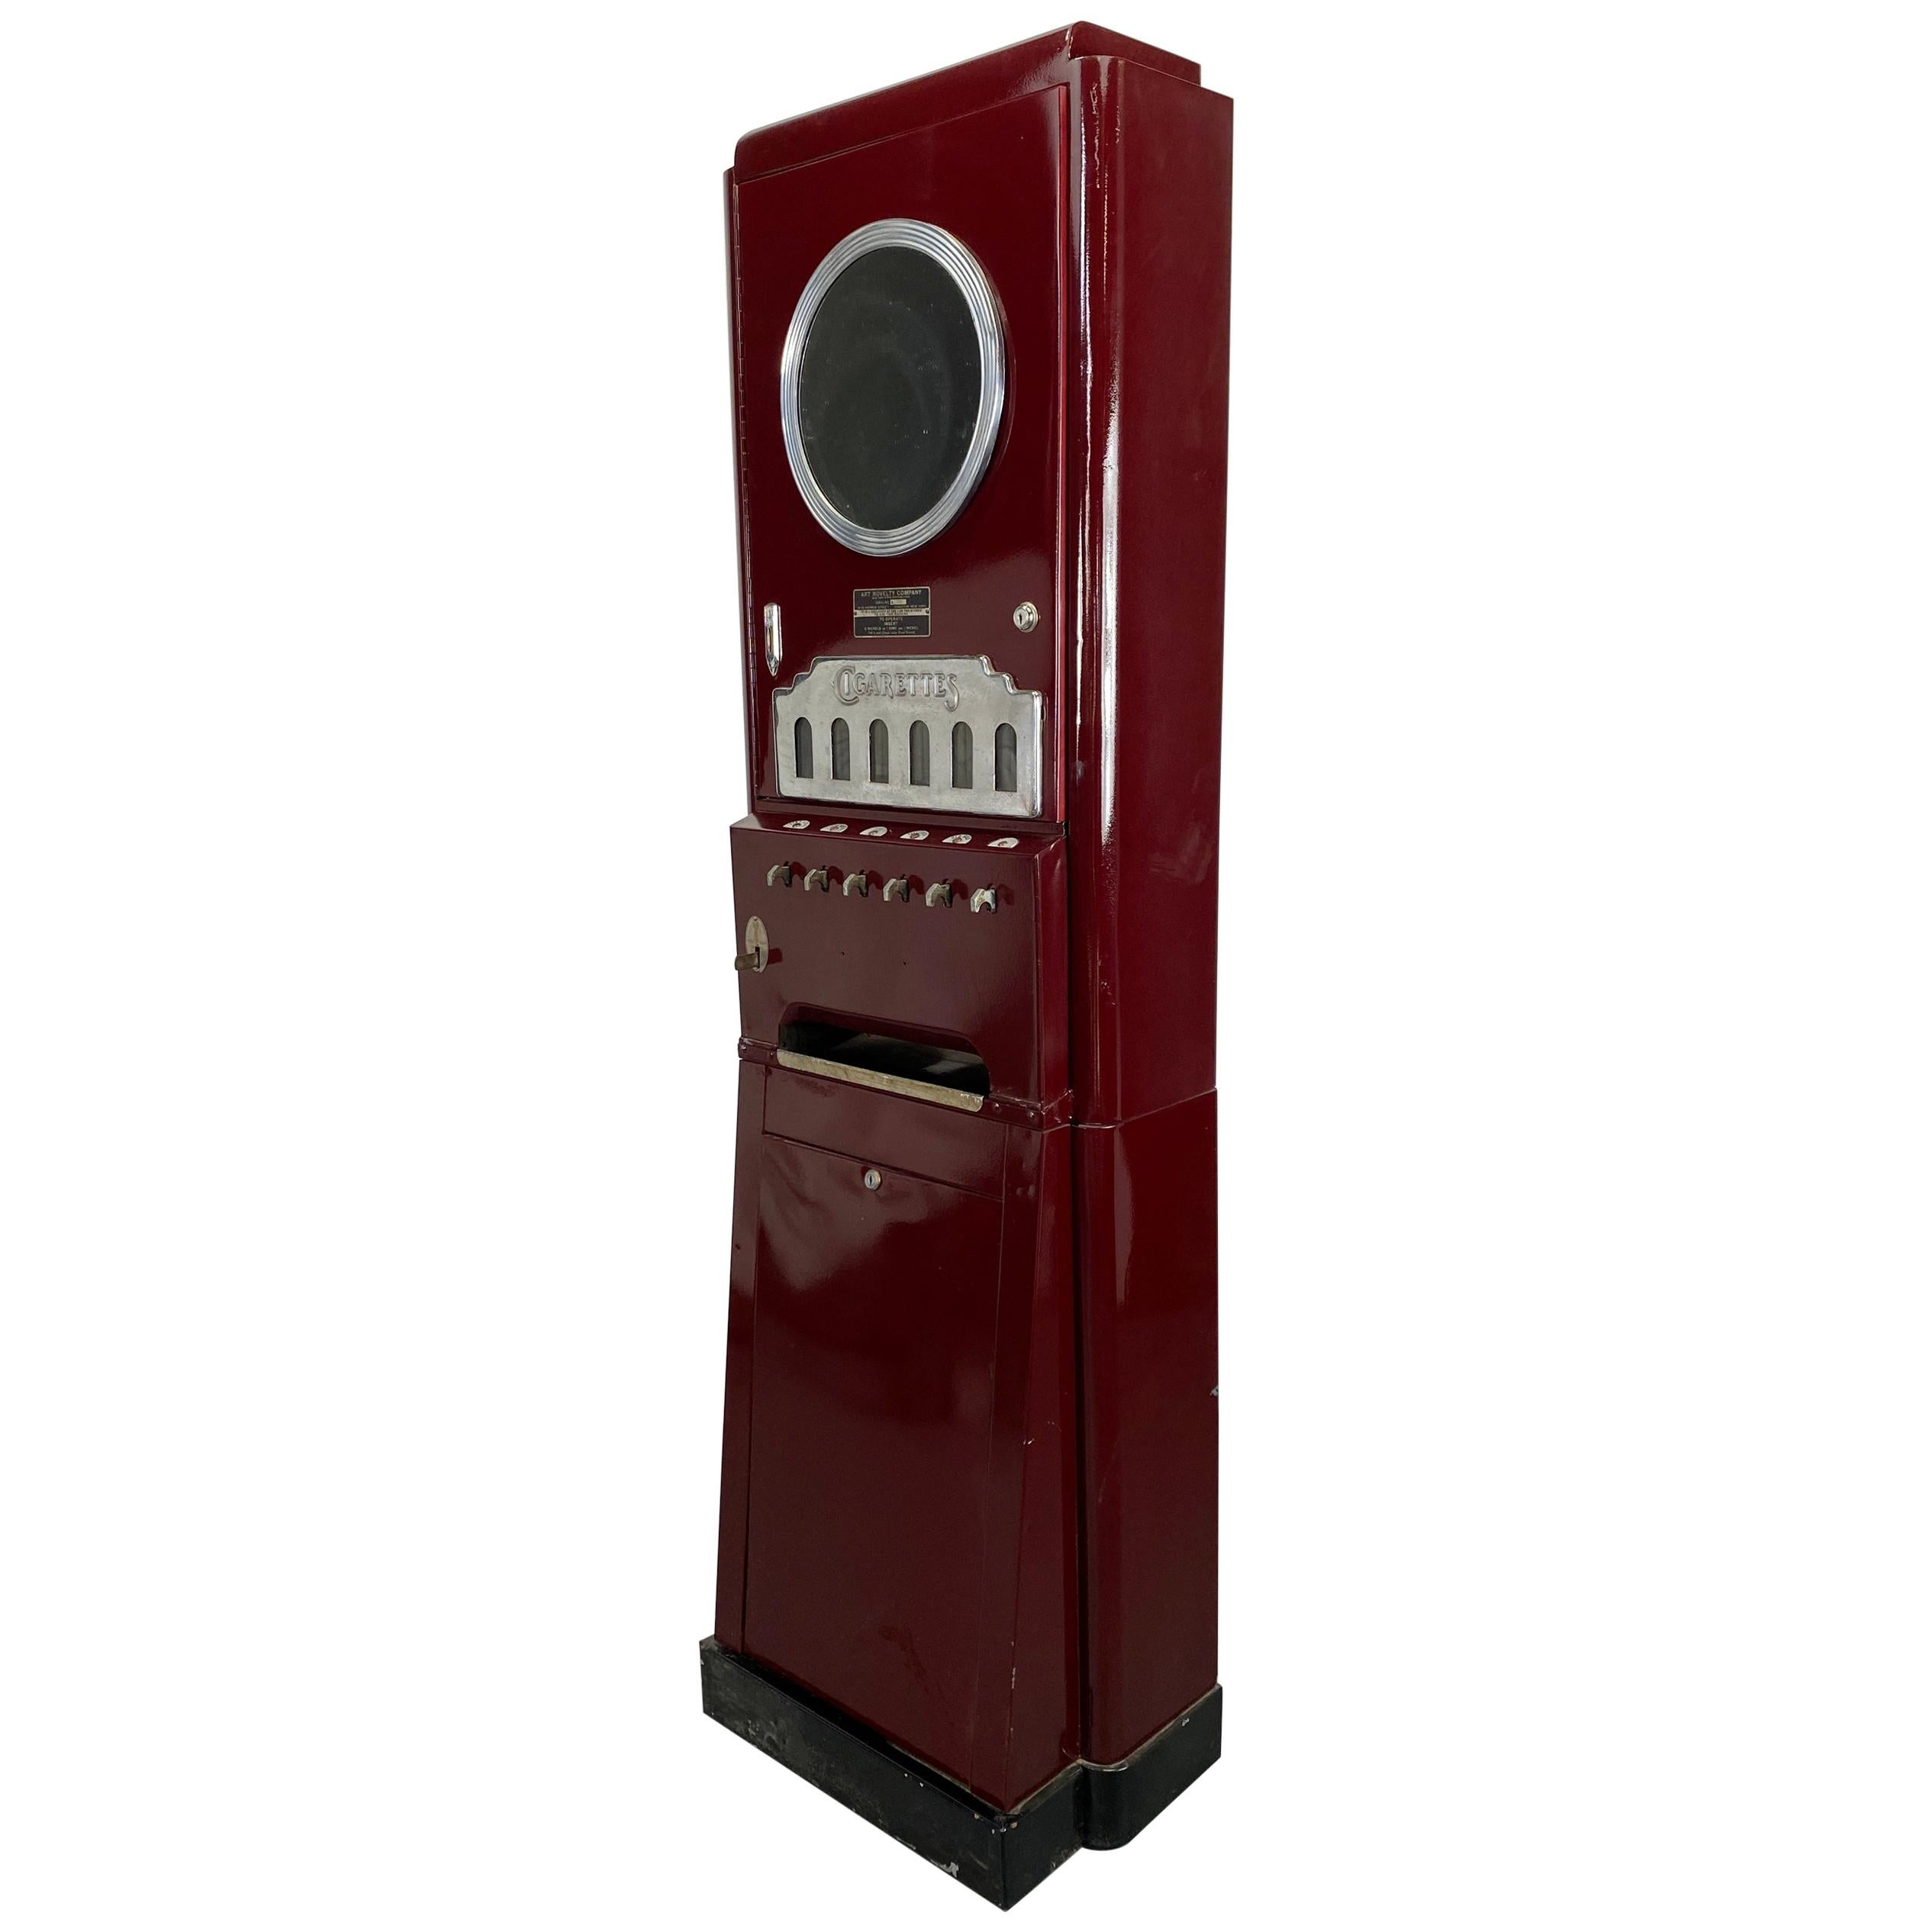 Art Deco Cigarette Vending Machine, Classic Deco Design, Art Novelty Company